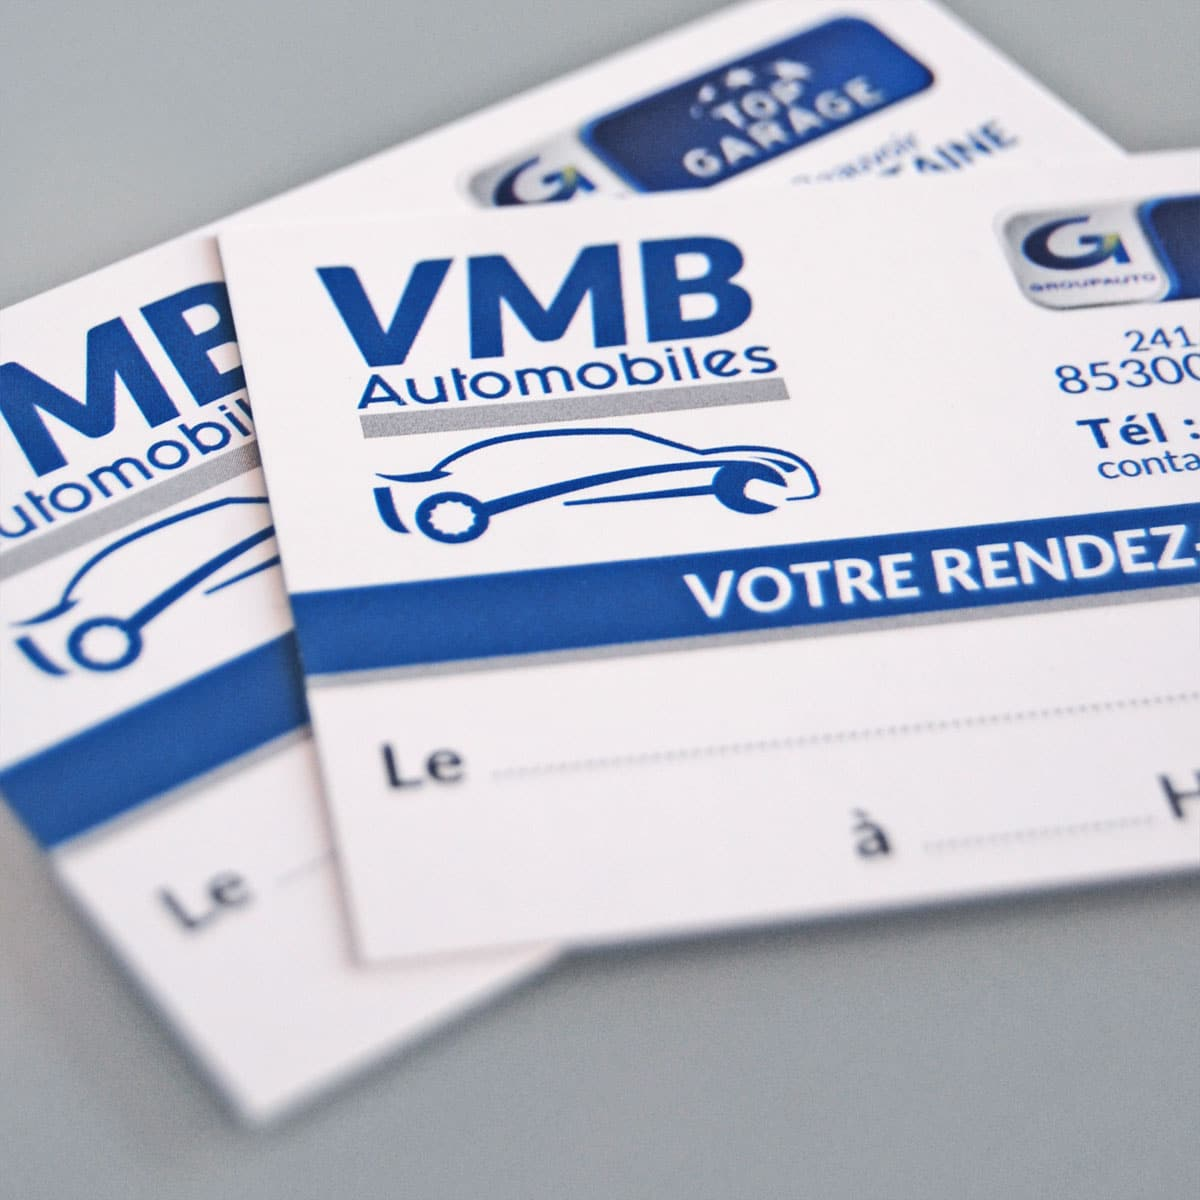 vmb-automobiles-carte1